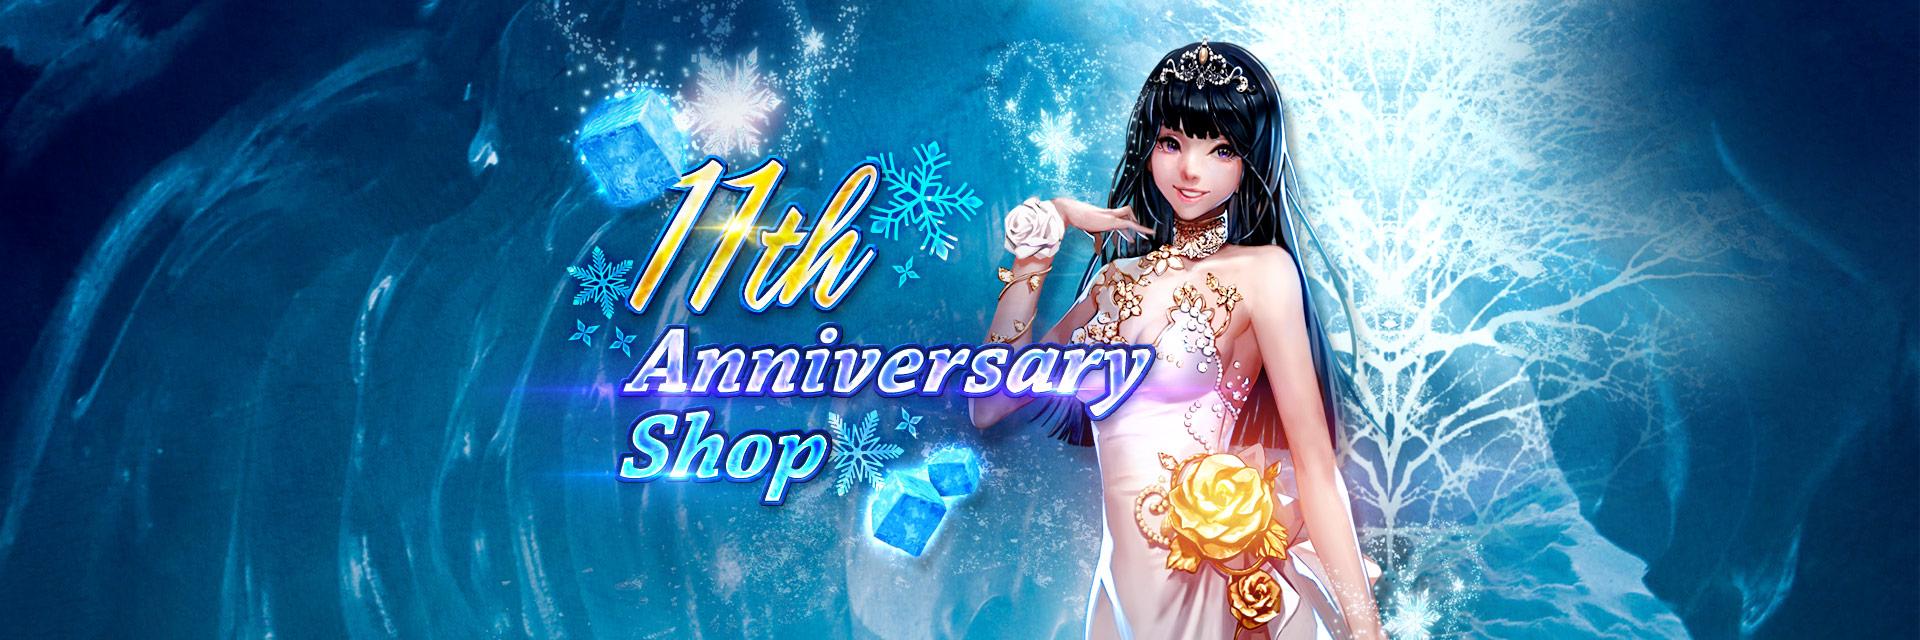 11th Anniversary Shop